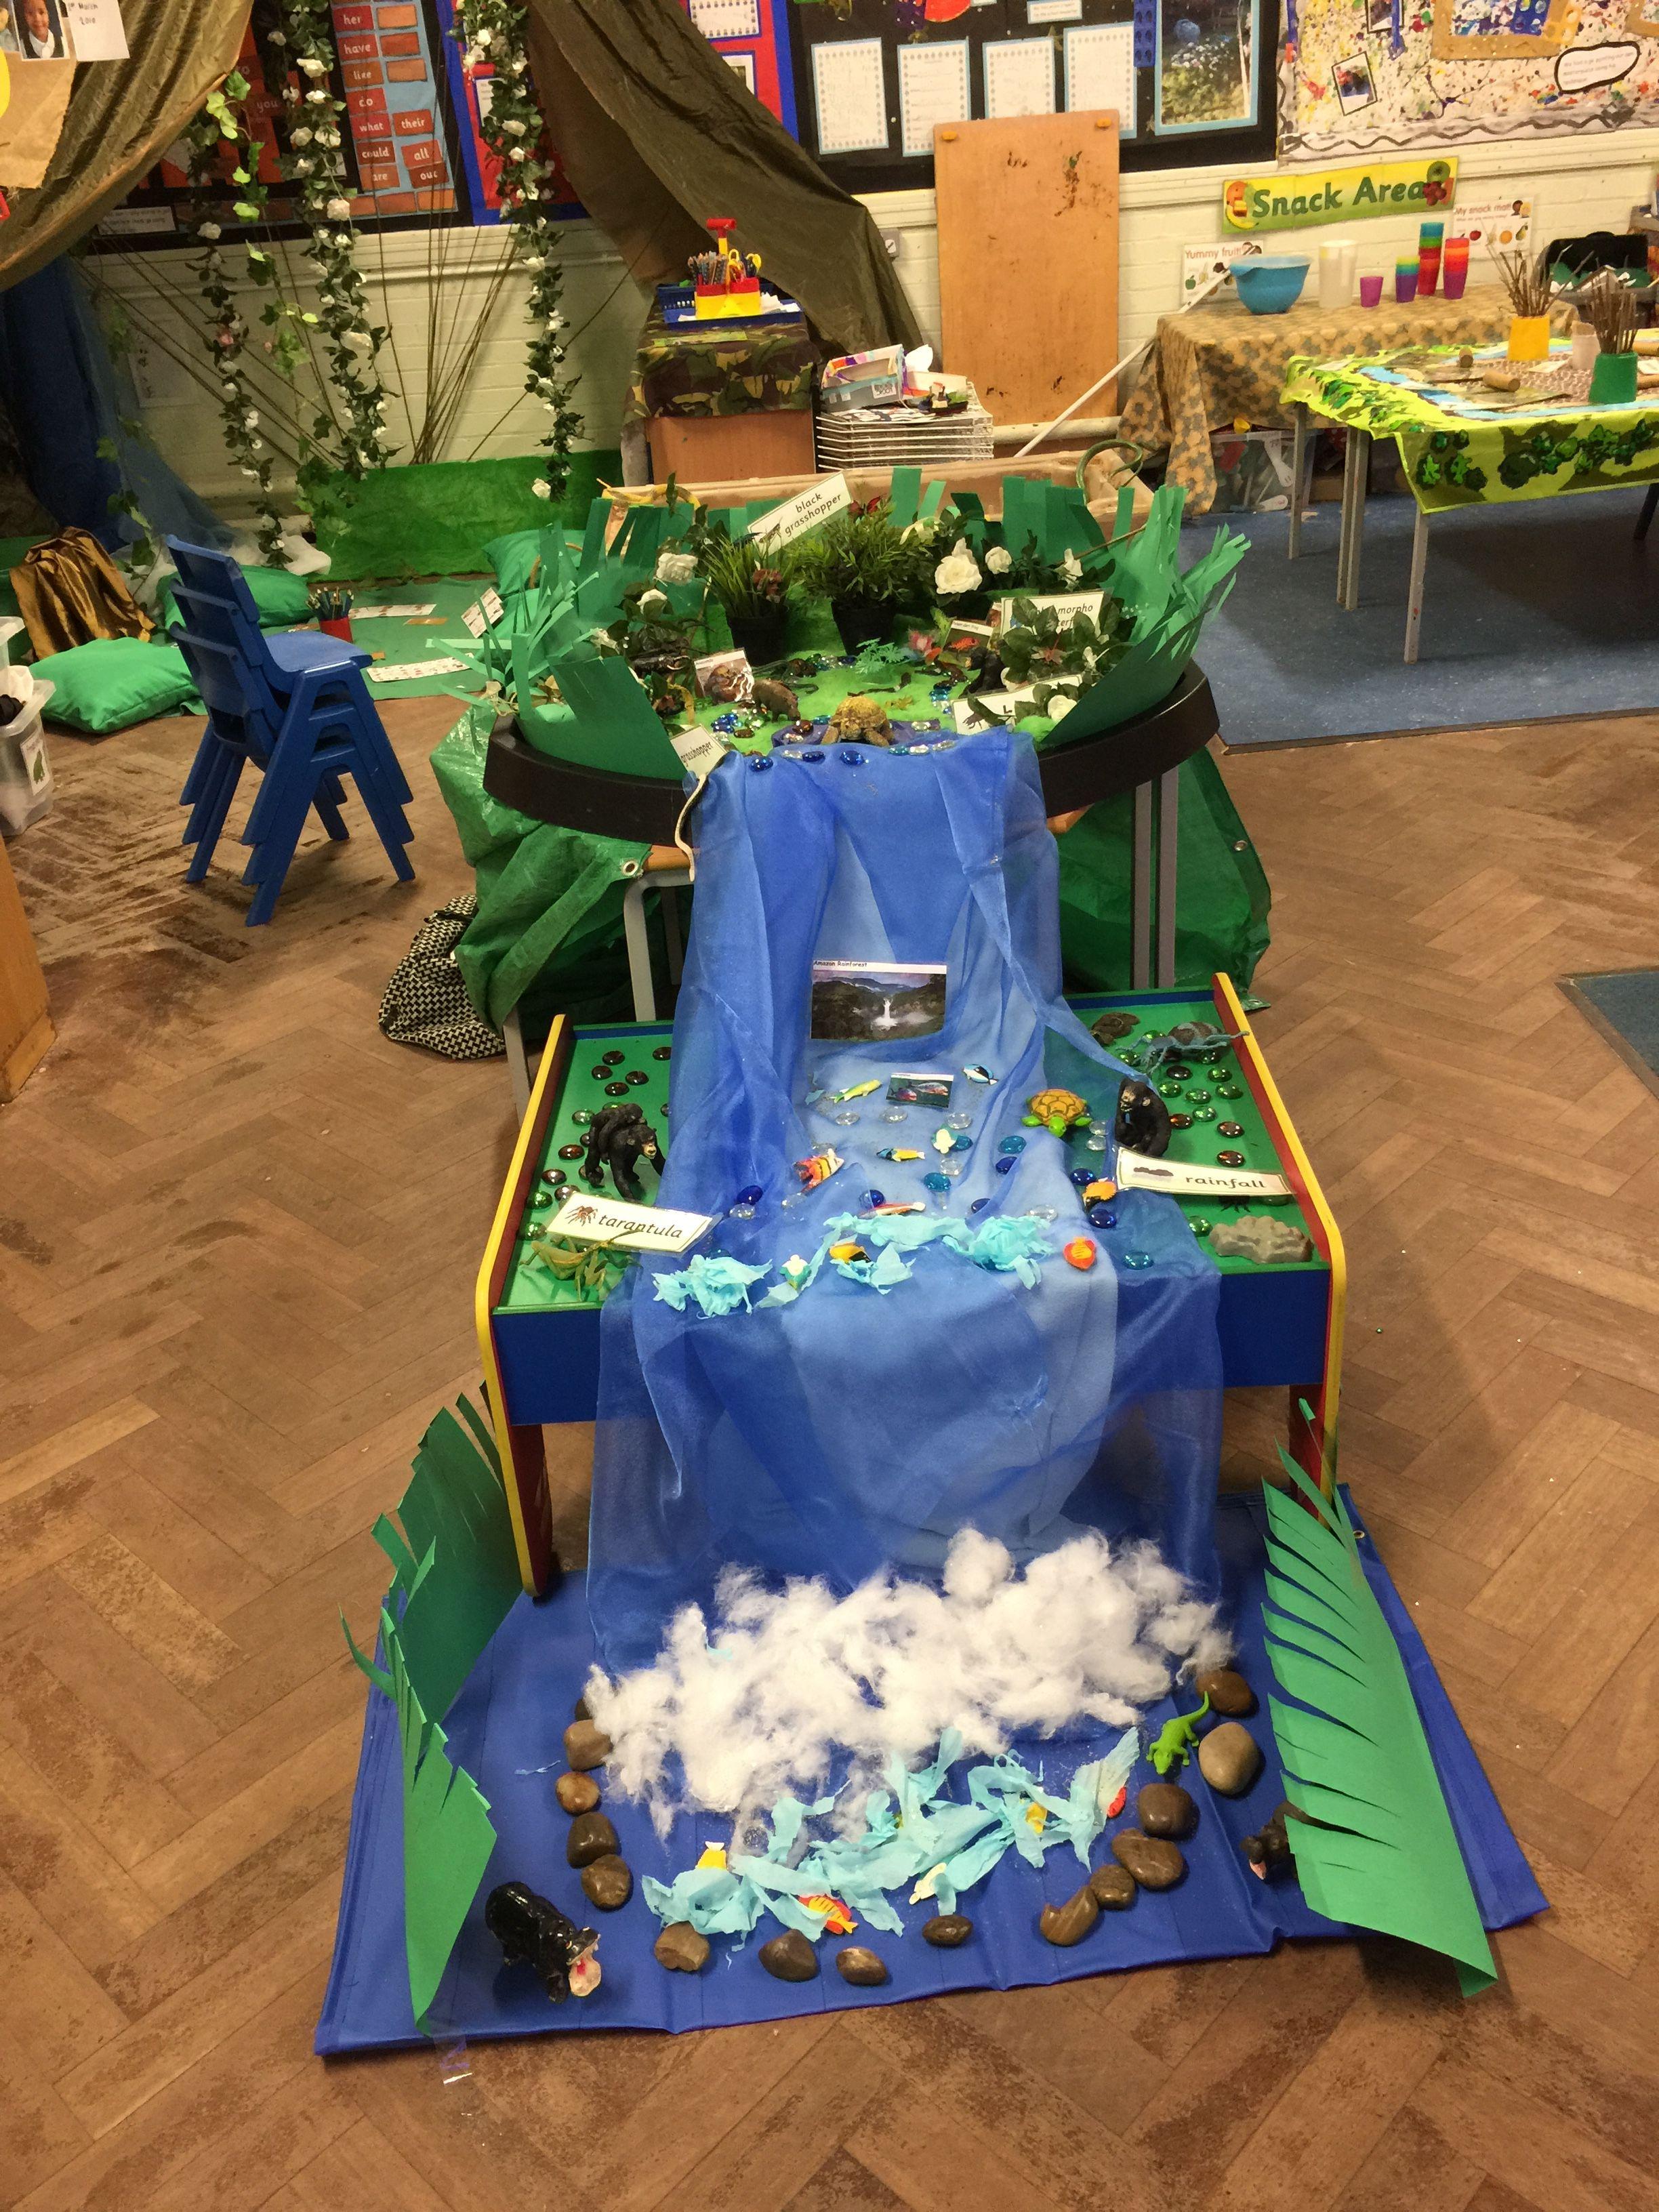 A Rainforest On 3 Levels Giving The Children Plenty Of